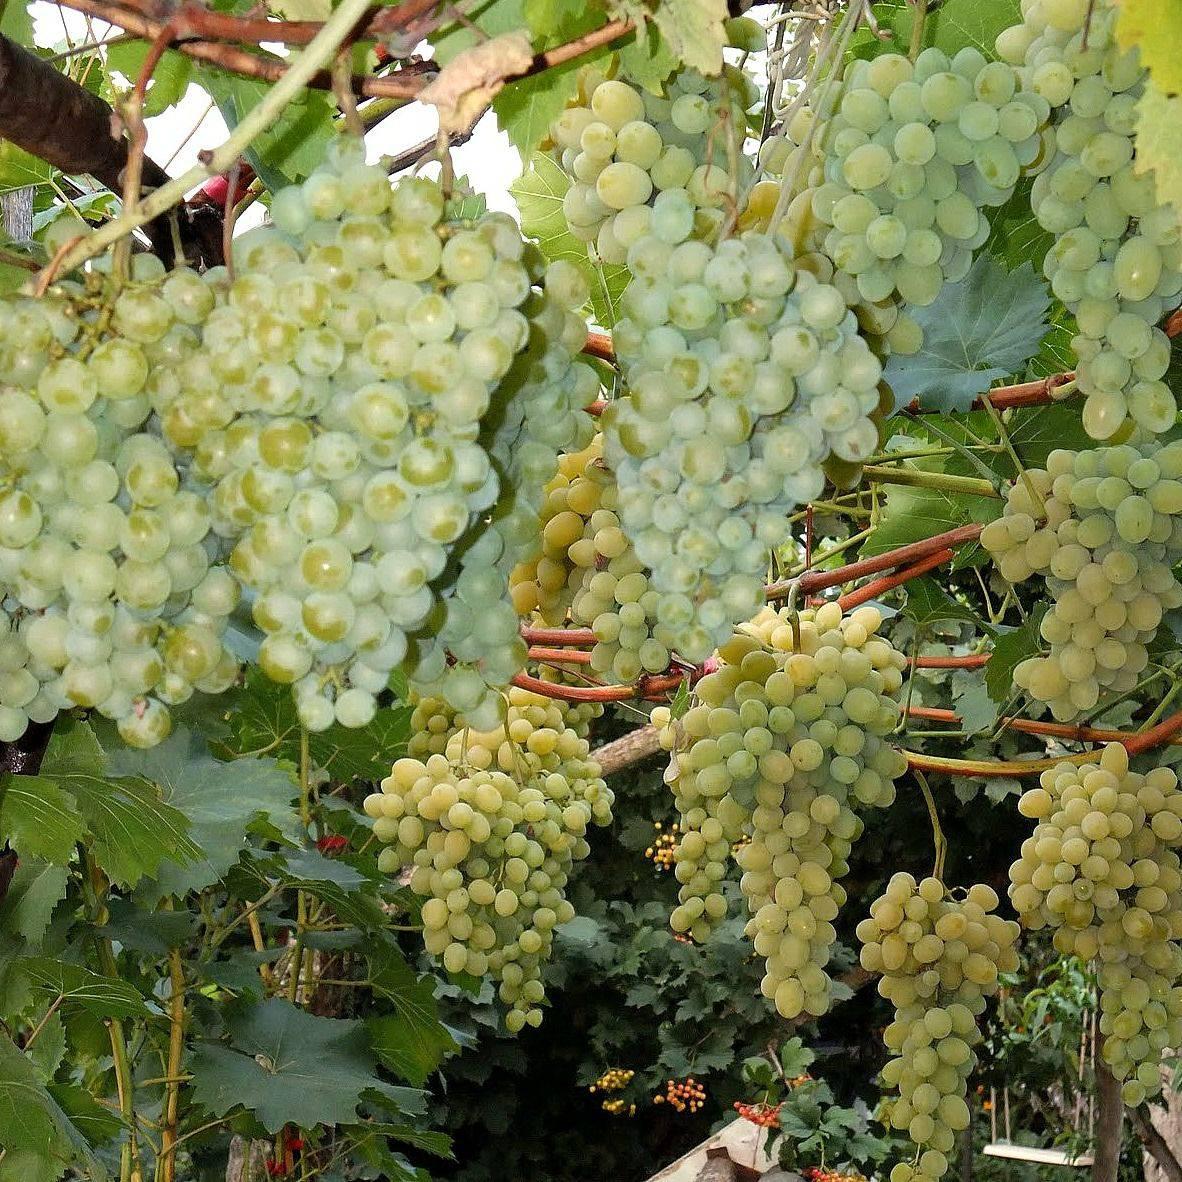 Виноград белое чудо: описание, фото, характеристика, правила посадки, ухода, особенности выращивания